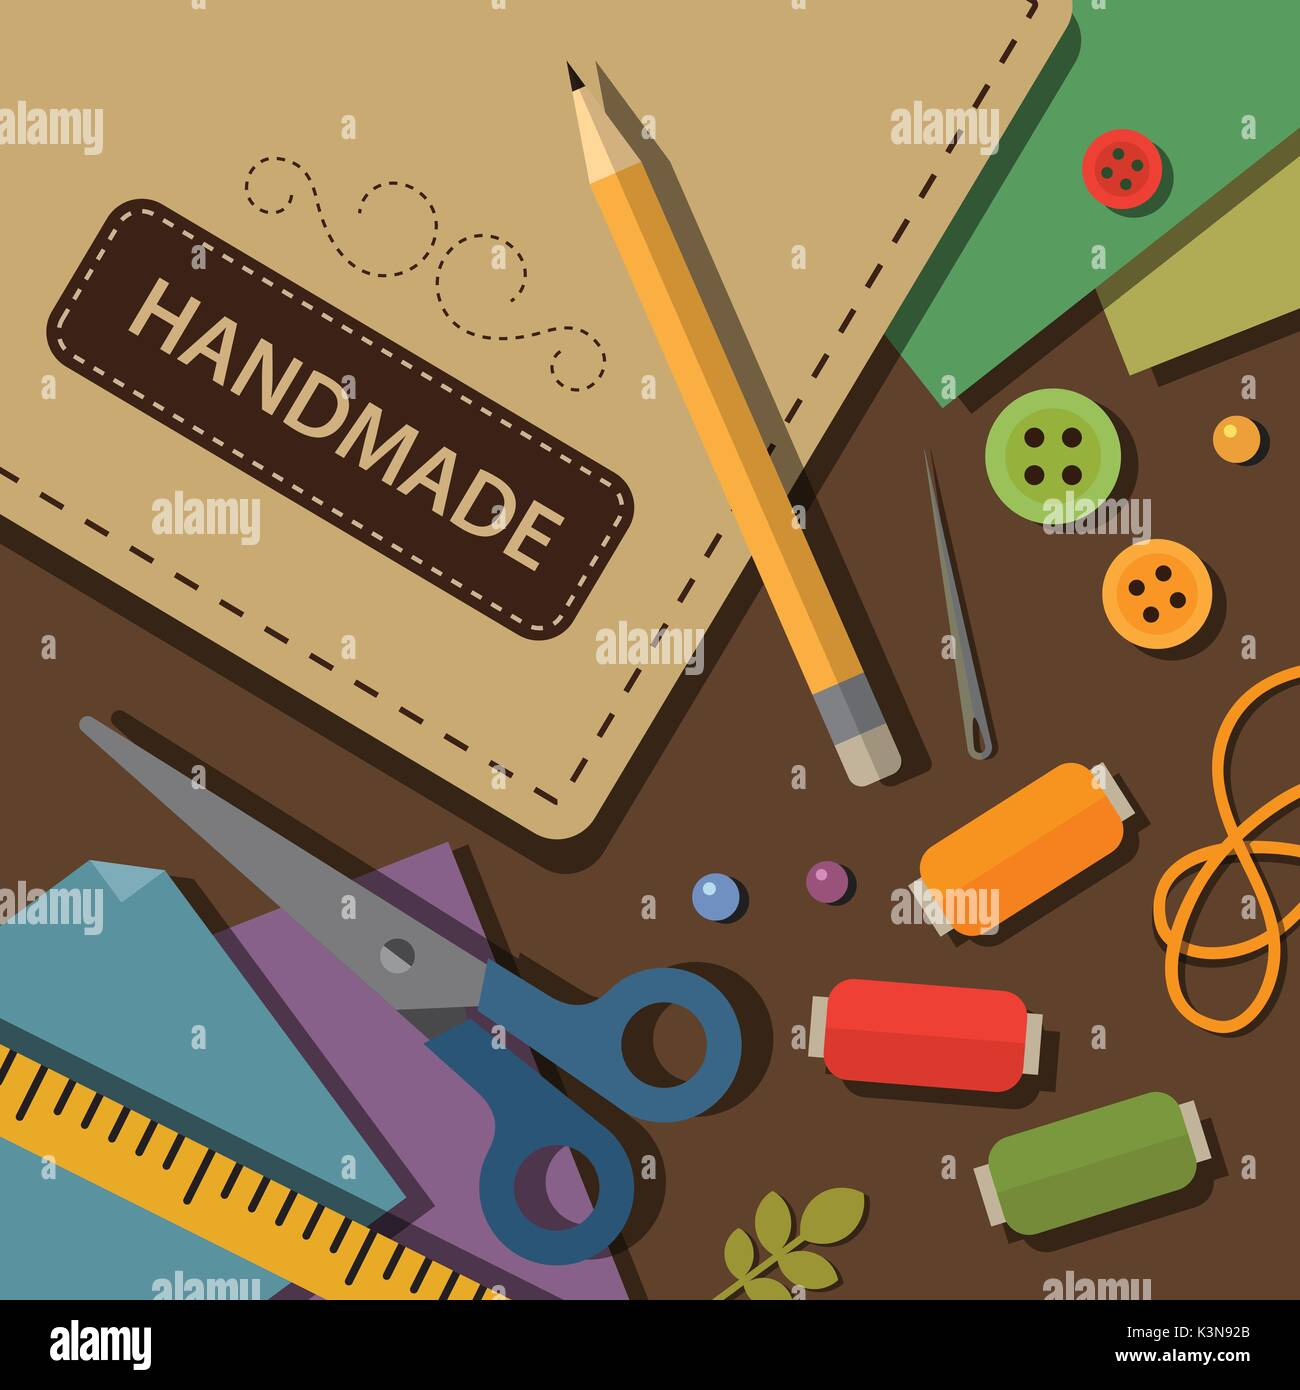 Handmade craft tools and materials flat illustration - Stock Vector